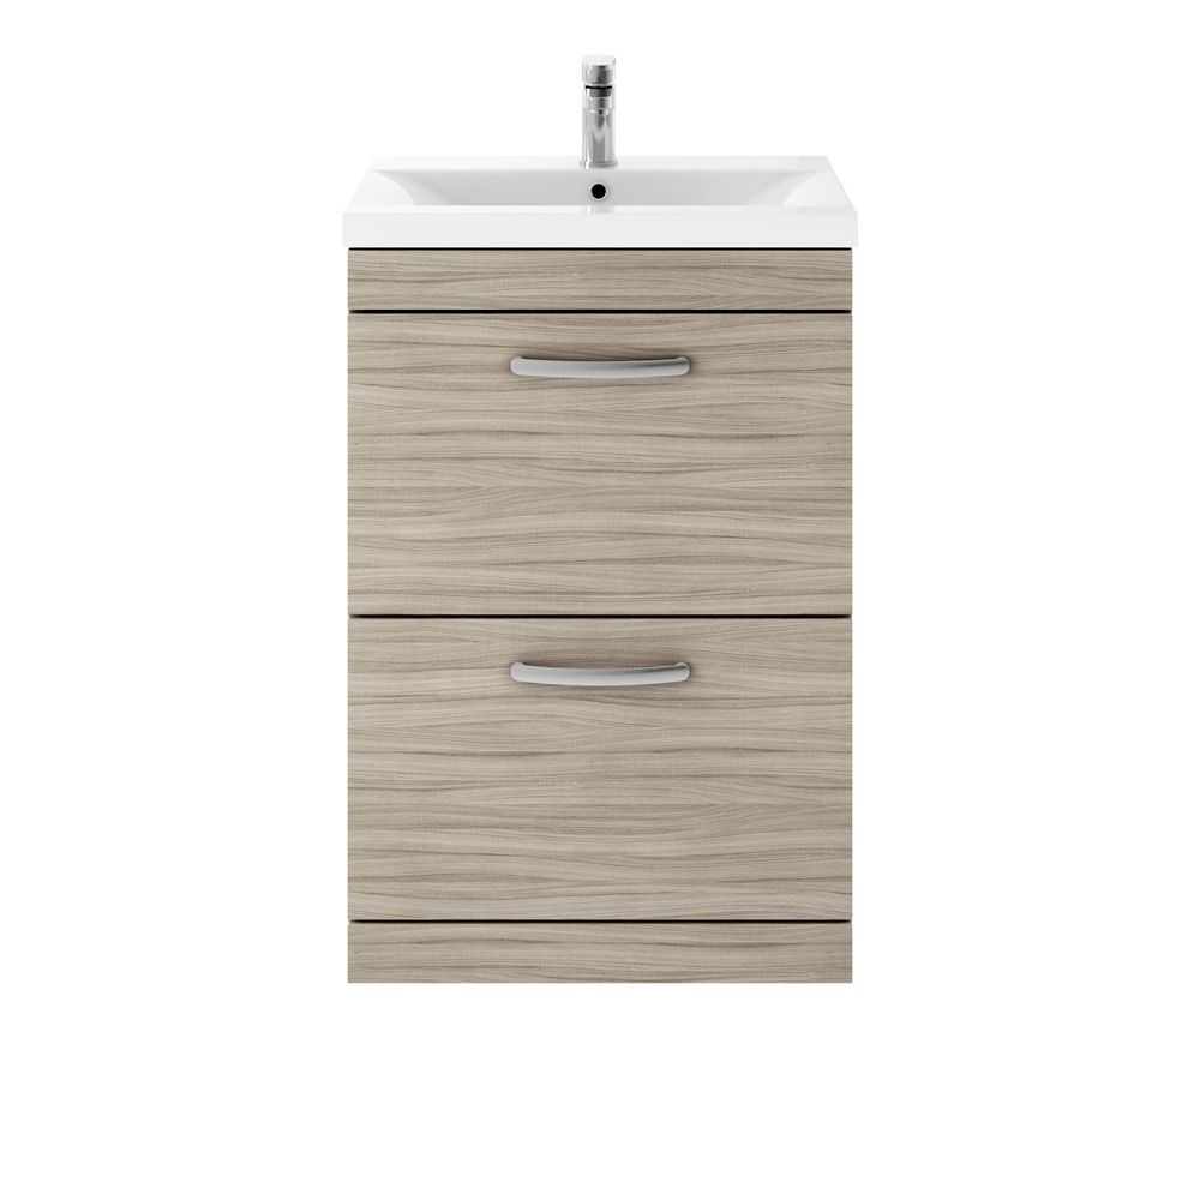 Premier Athena Driftwood 2 Drawer Floor Standing Vanity Unit 600mm